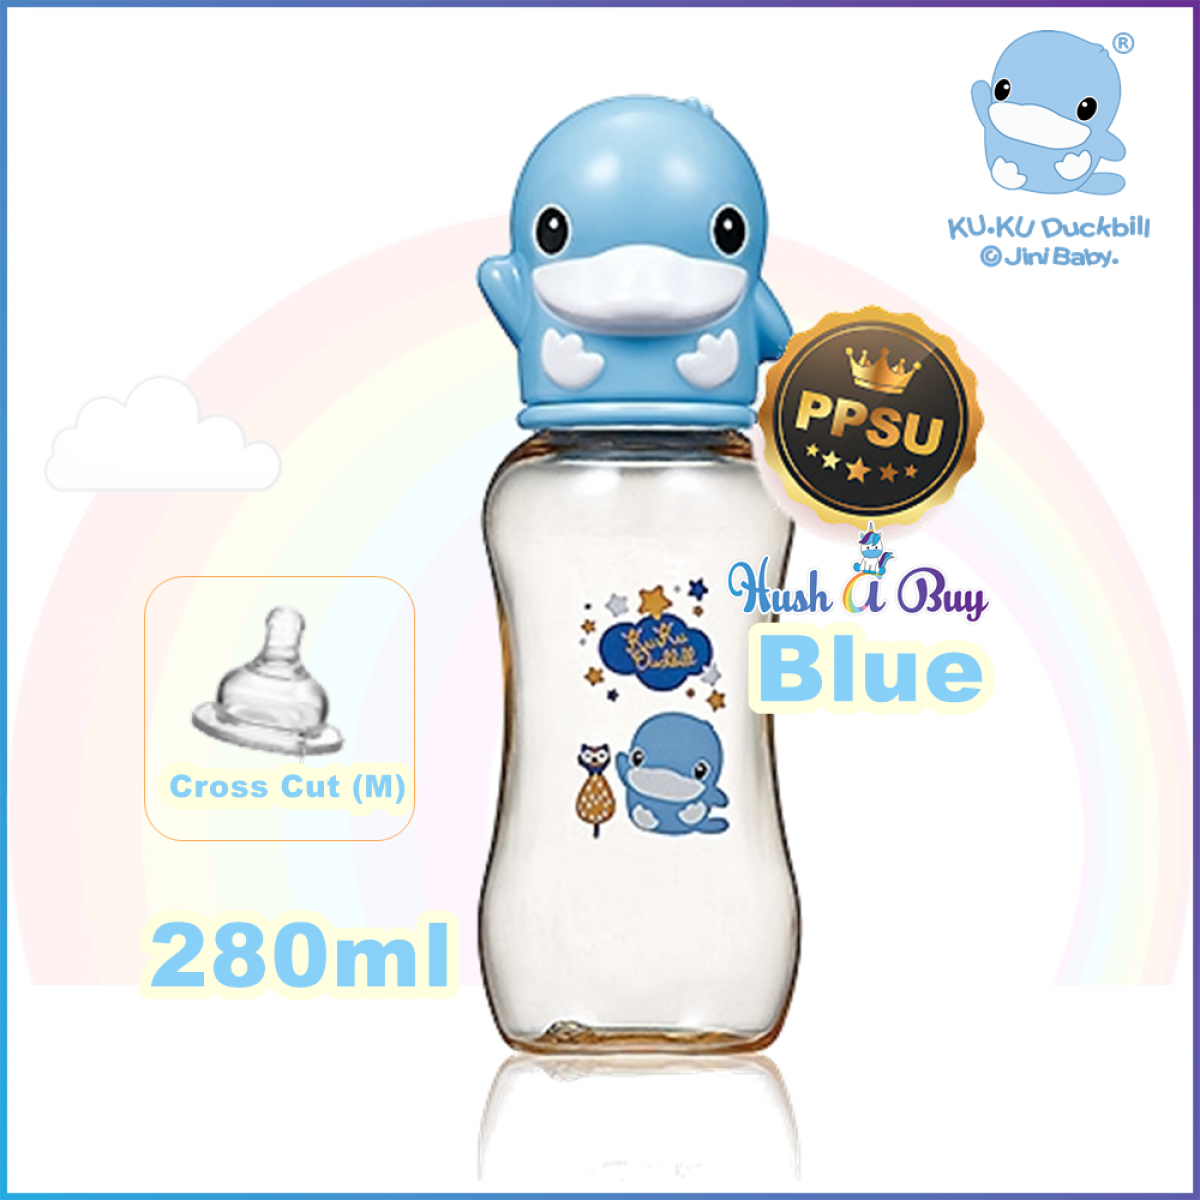 KUKU Duckbill PPSU Standard Feeding Bottle-140ml, 240ml, 280ml